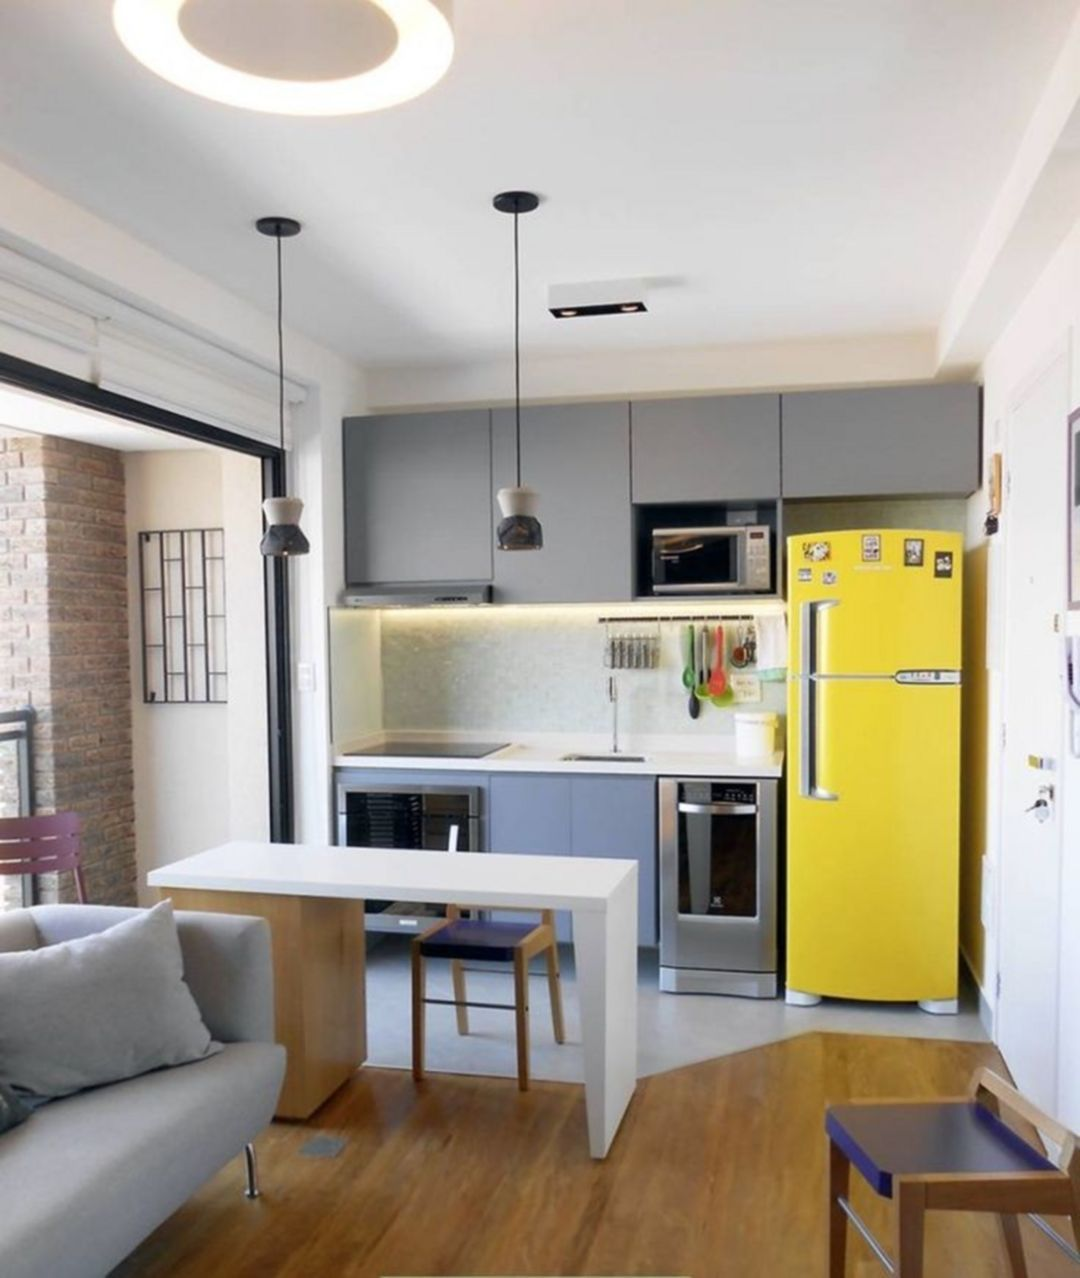 Studio Kitchen Design Ideas: 35 Outstanding Small Kitchen Studio Designs For Comfort